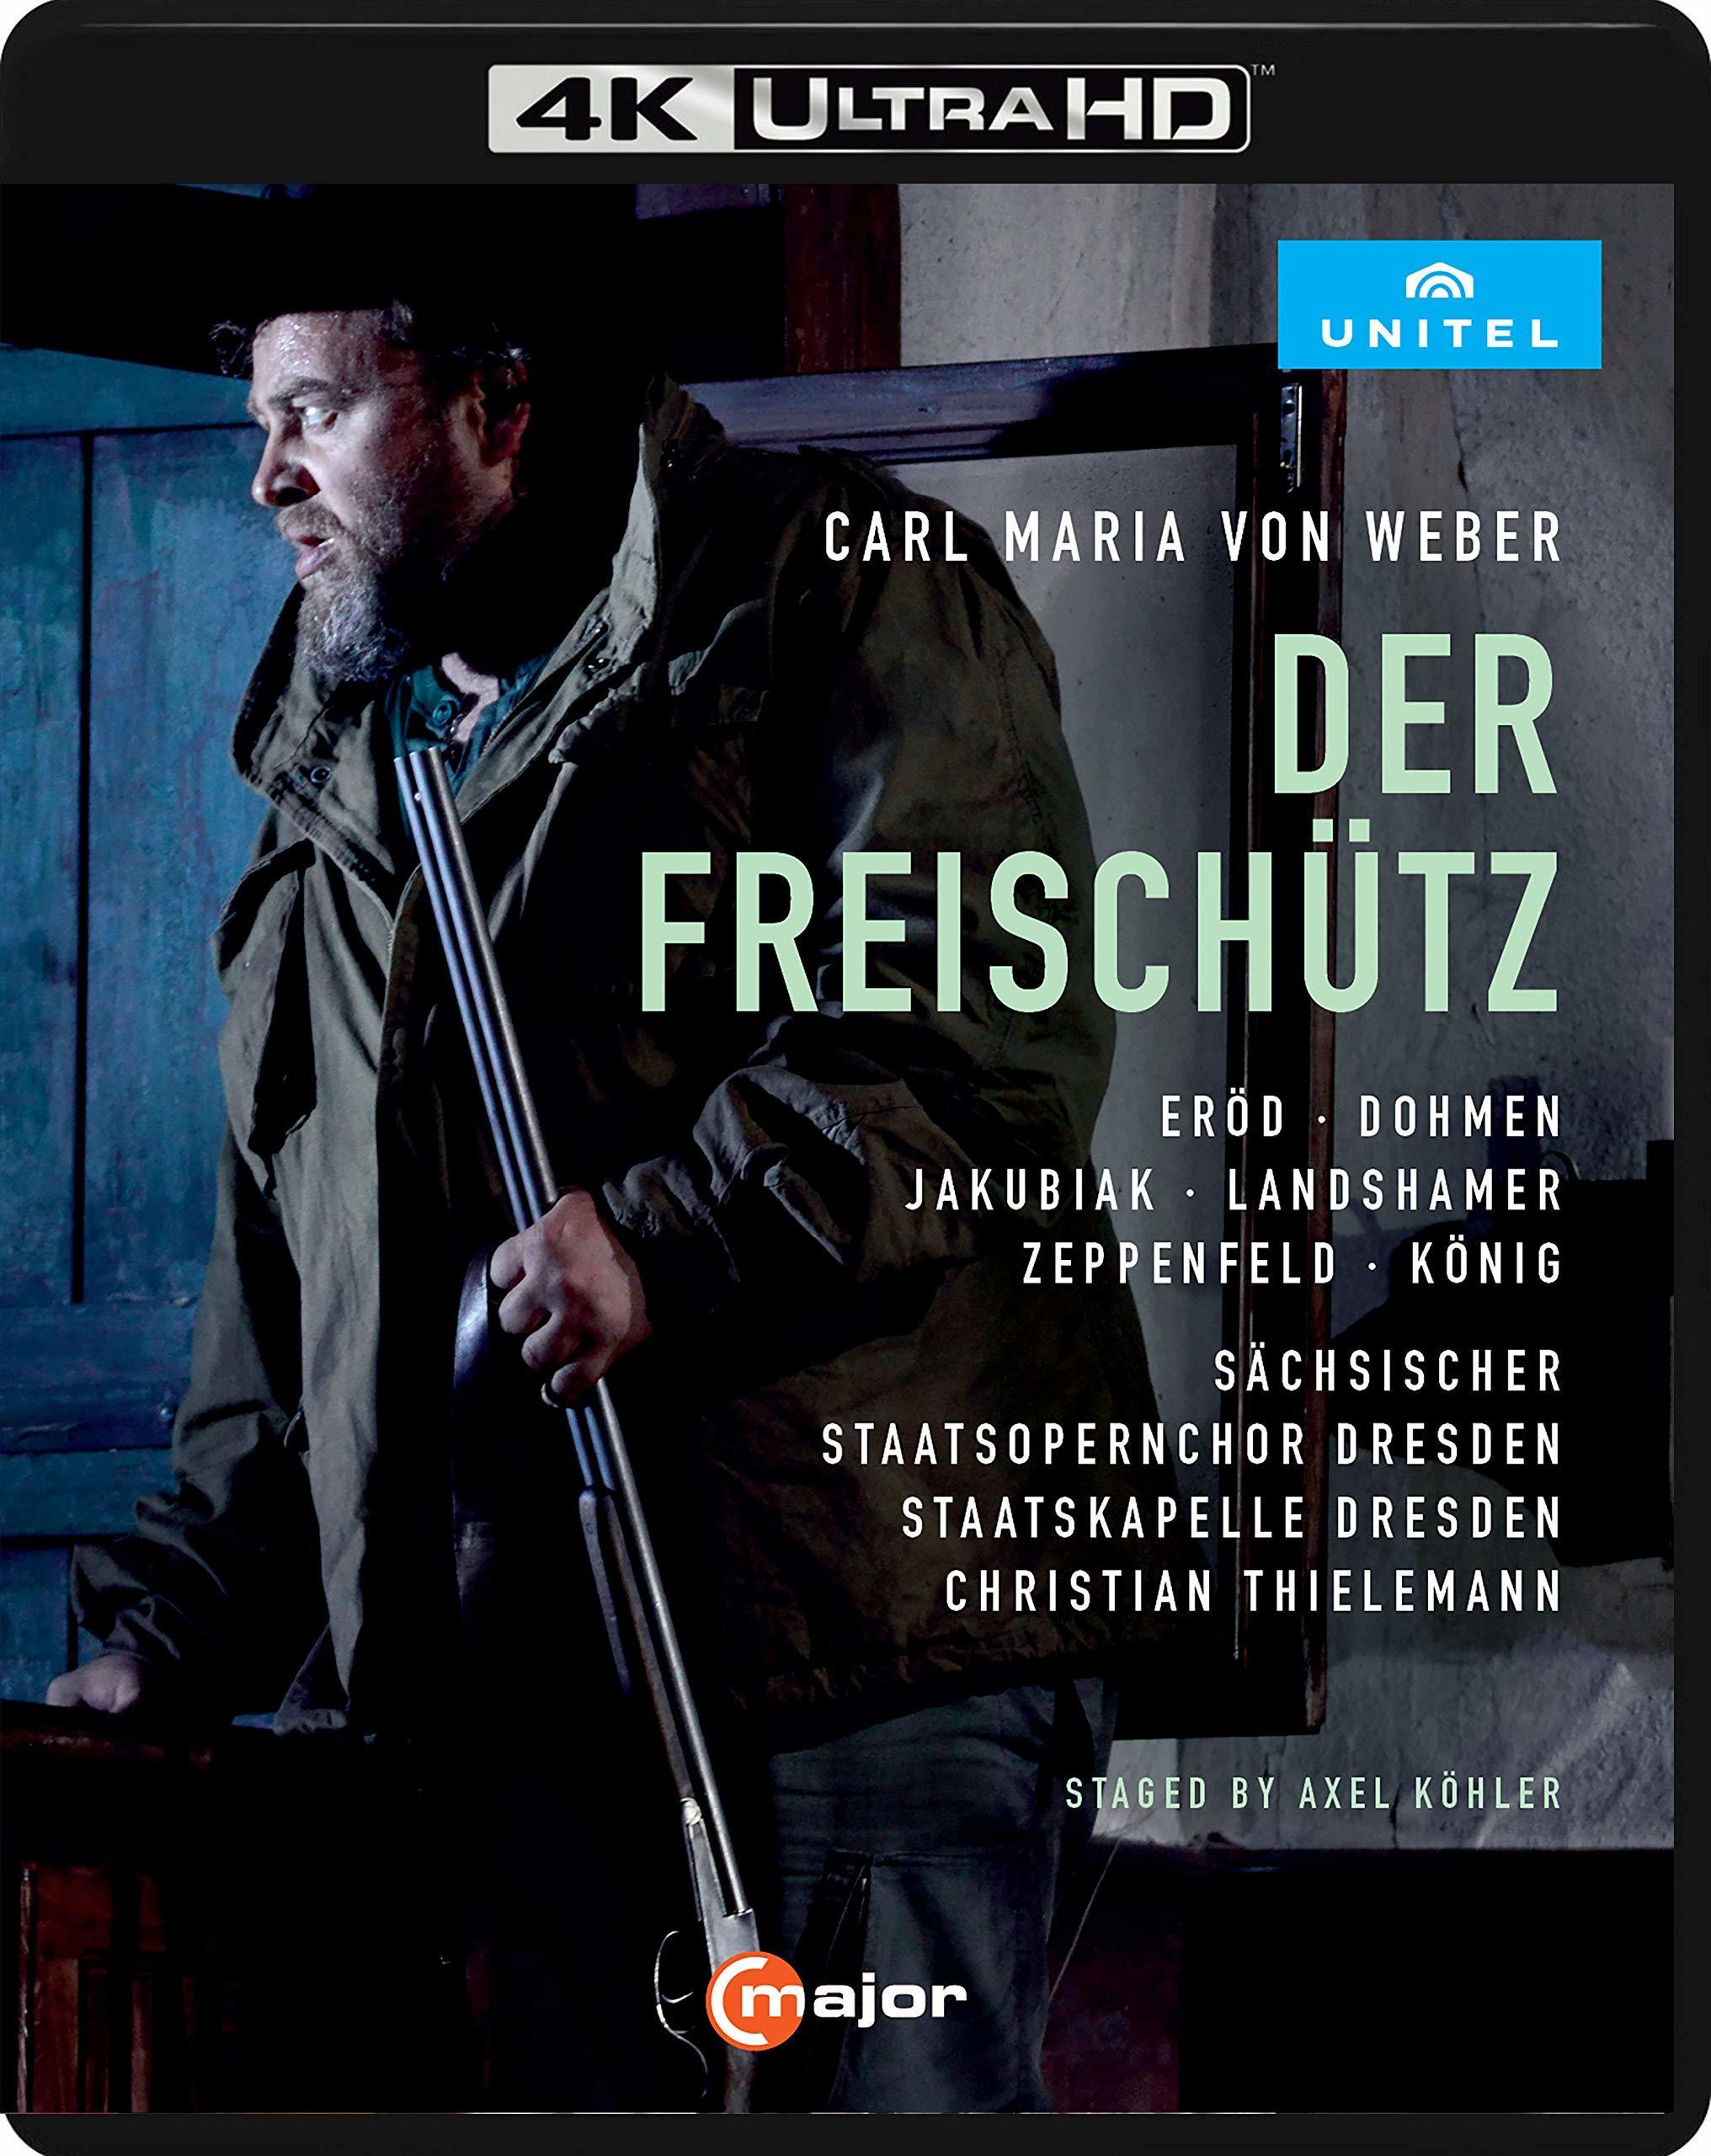 Der Freischütz (Weber)(4K Ultra HD Blu-ray)(Pre-order / May 28)